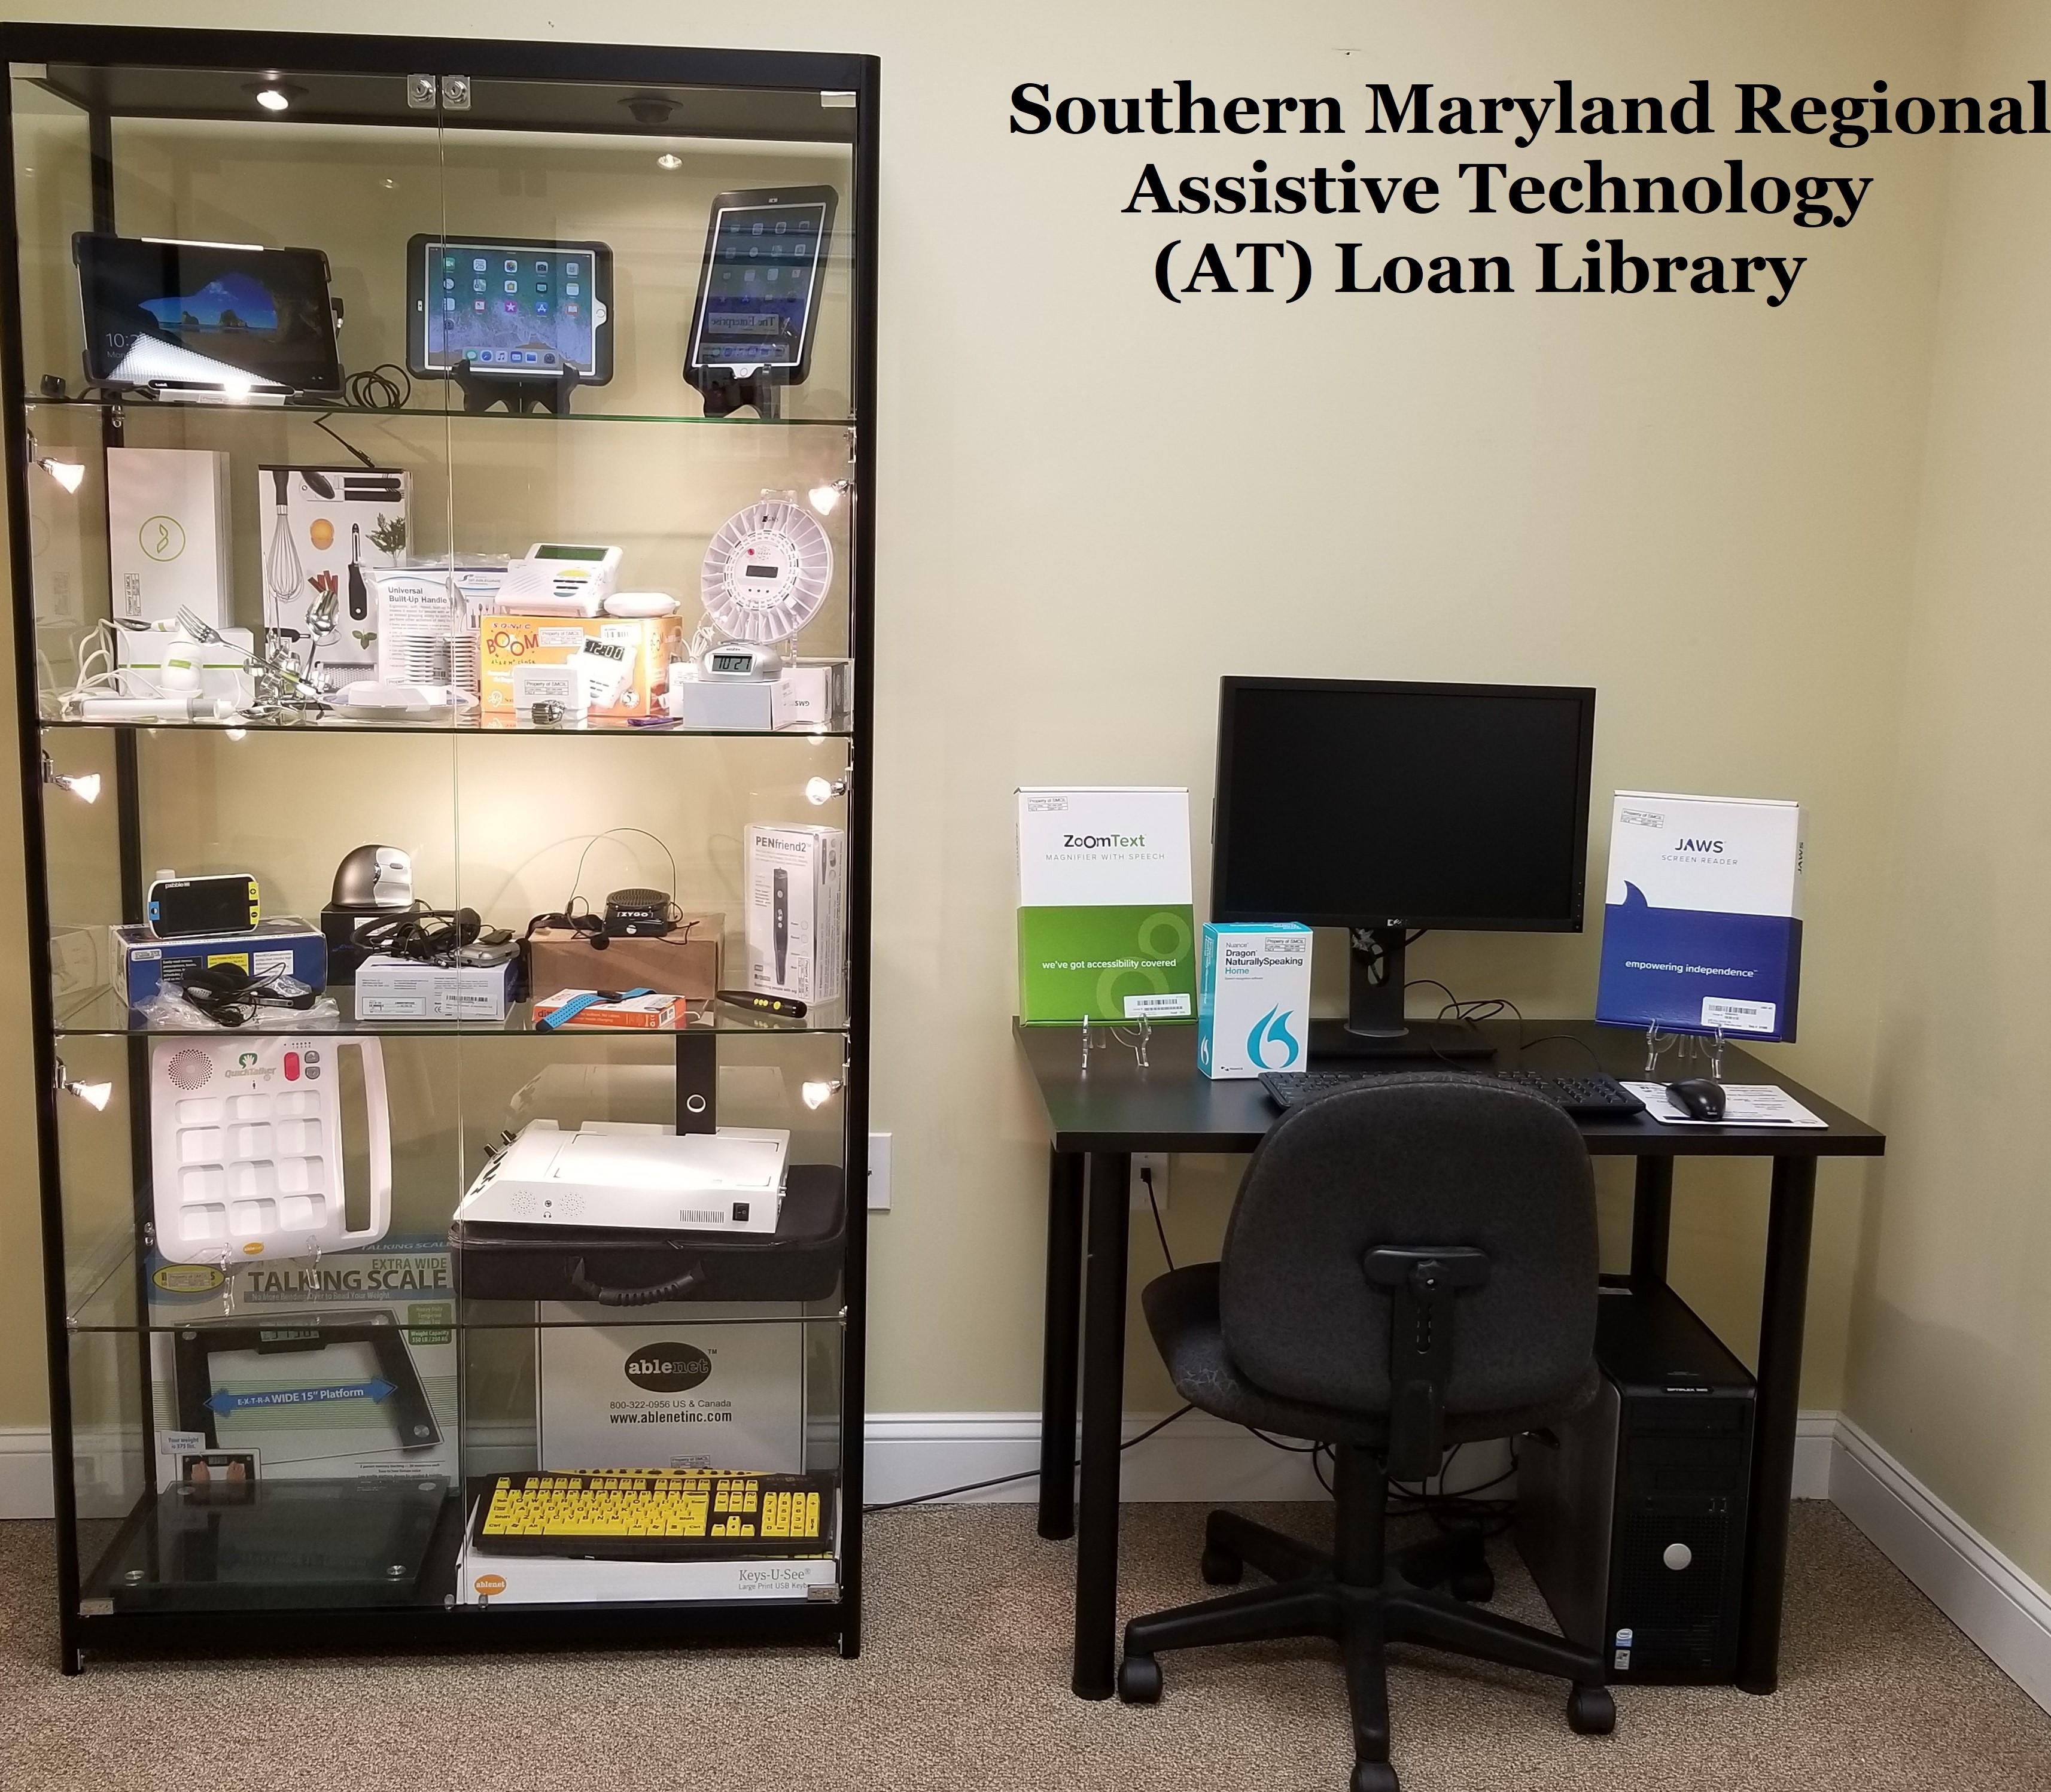 AT loan library 2 (2)